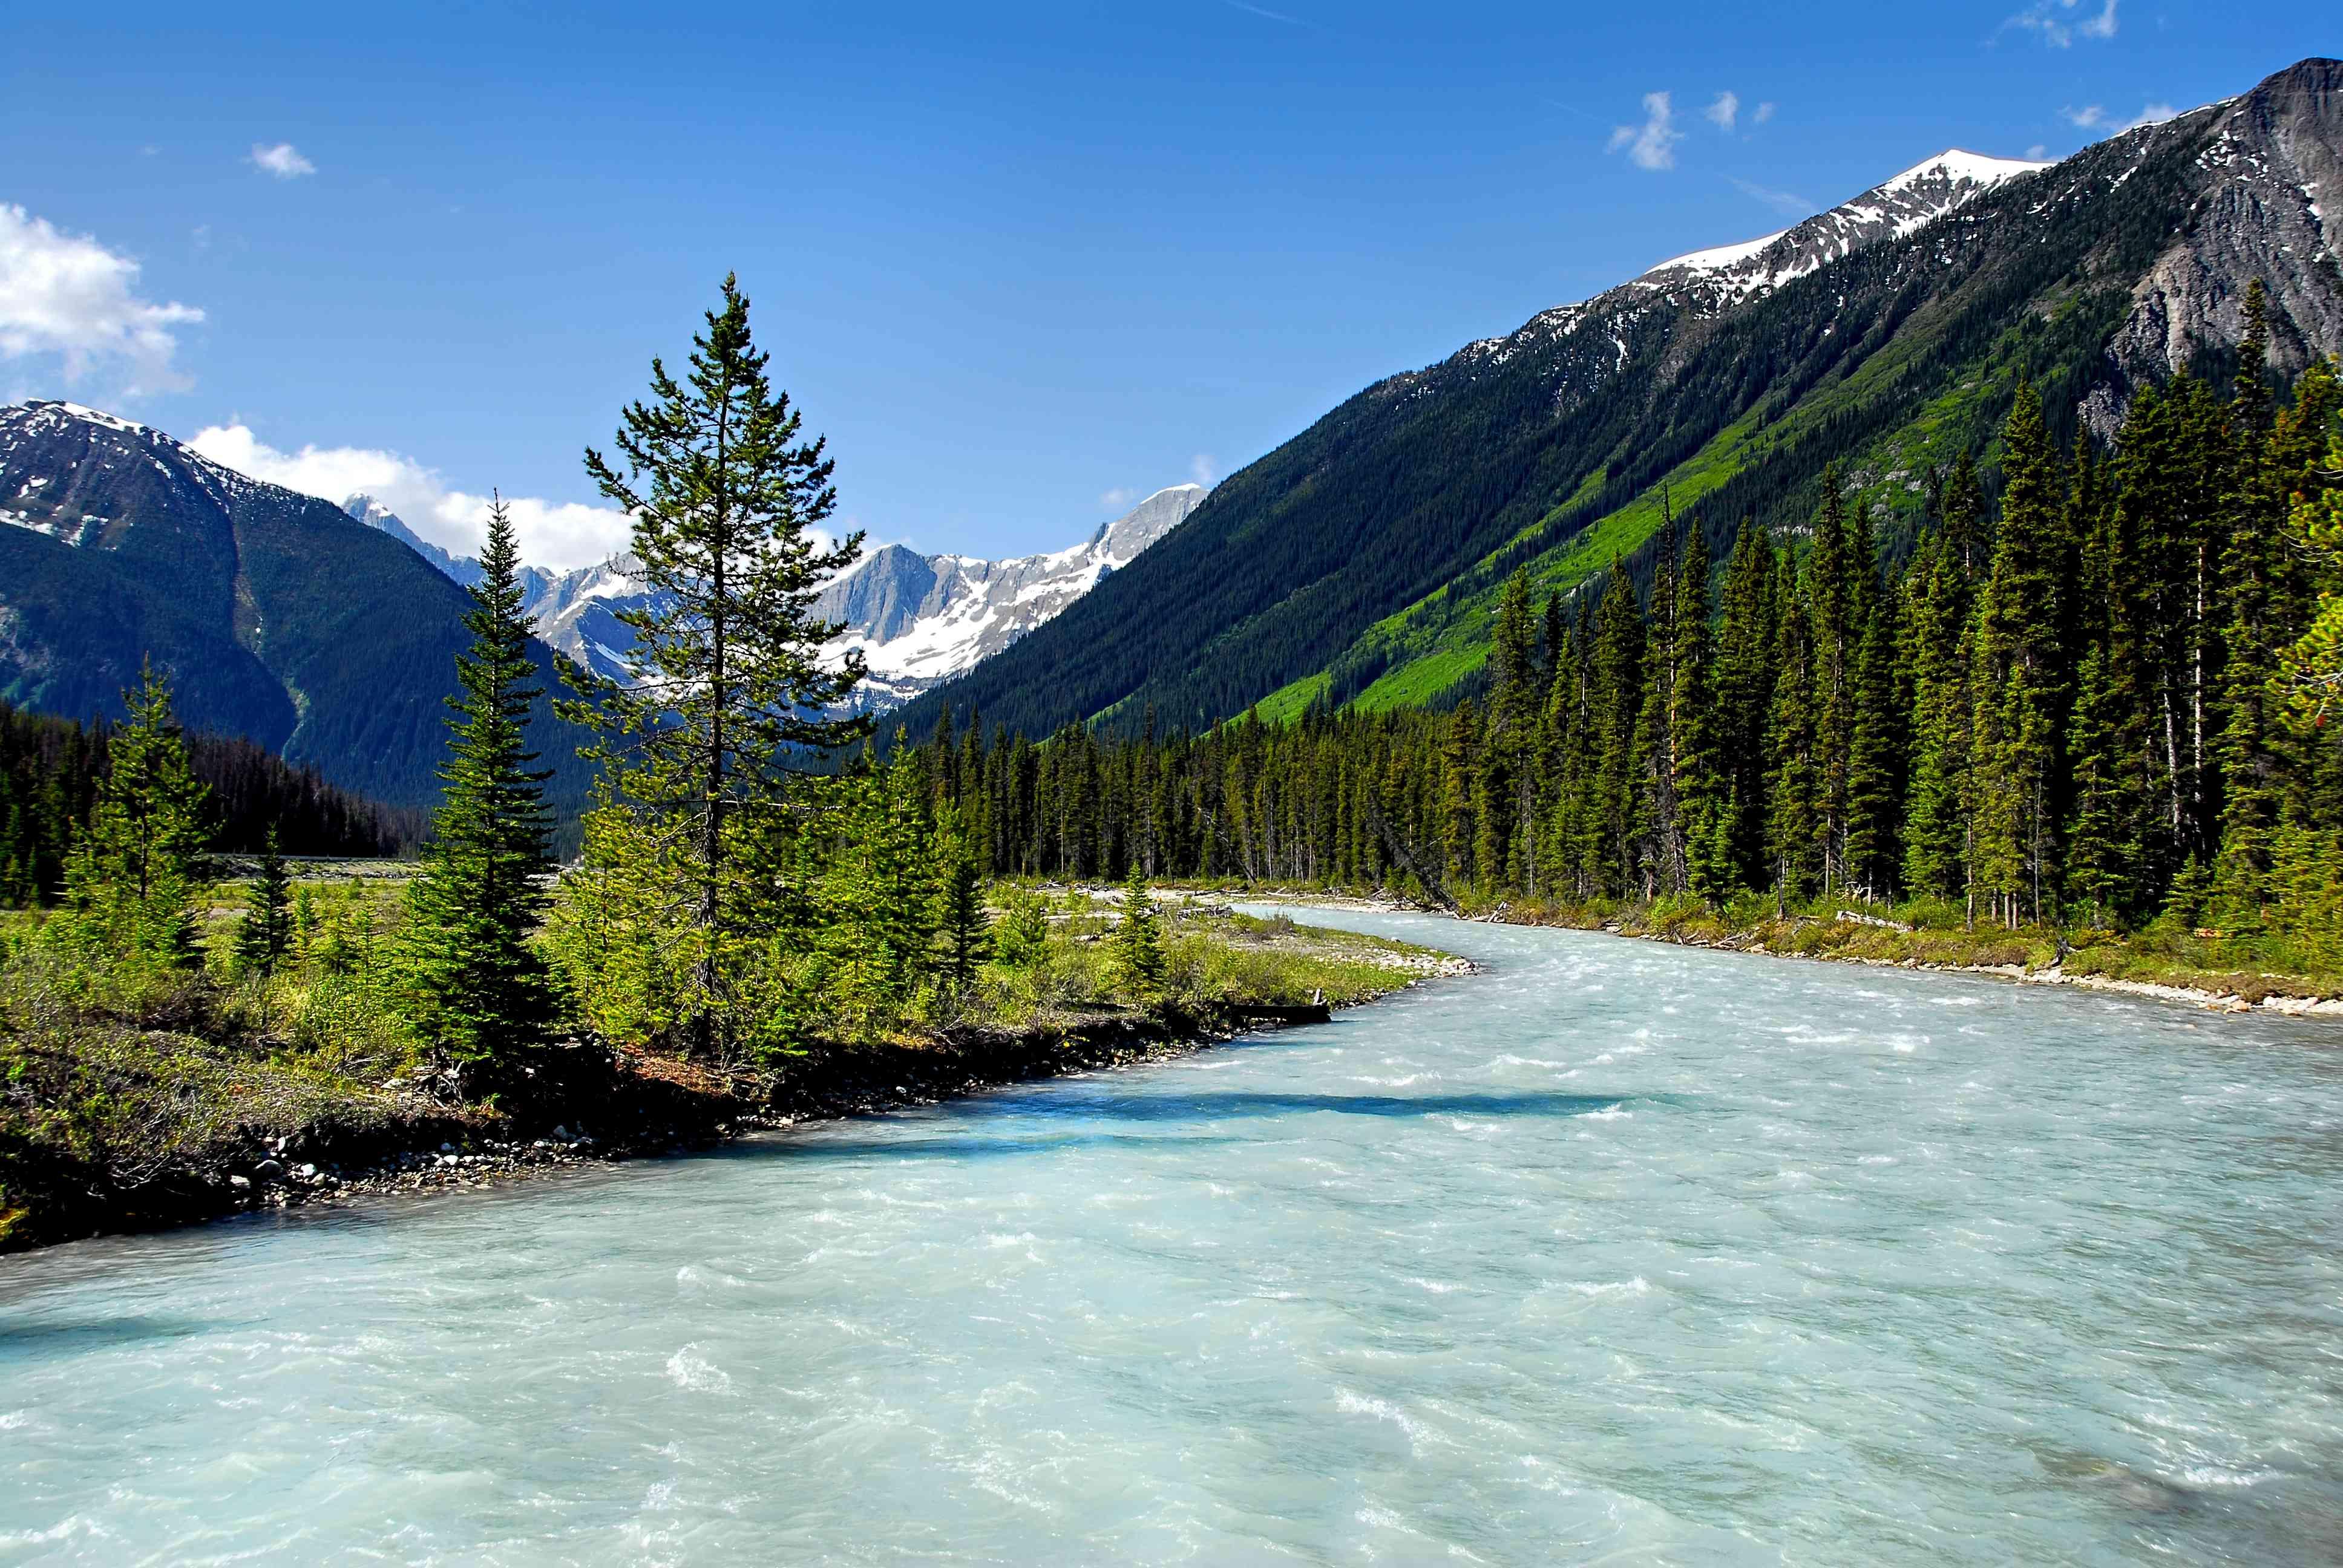 Vermilion River in Kootenay national Park, BC,Canada.